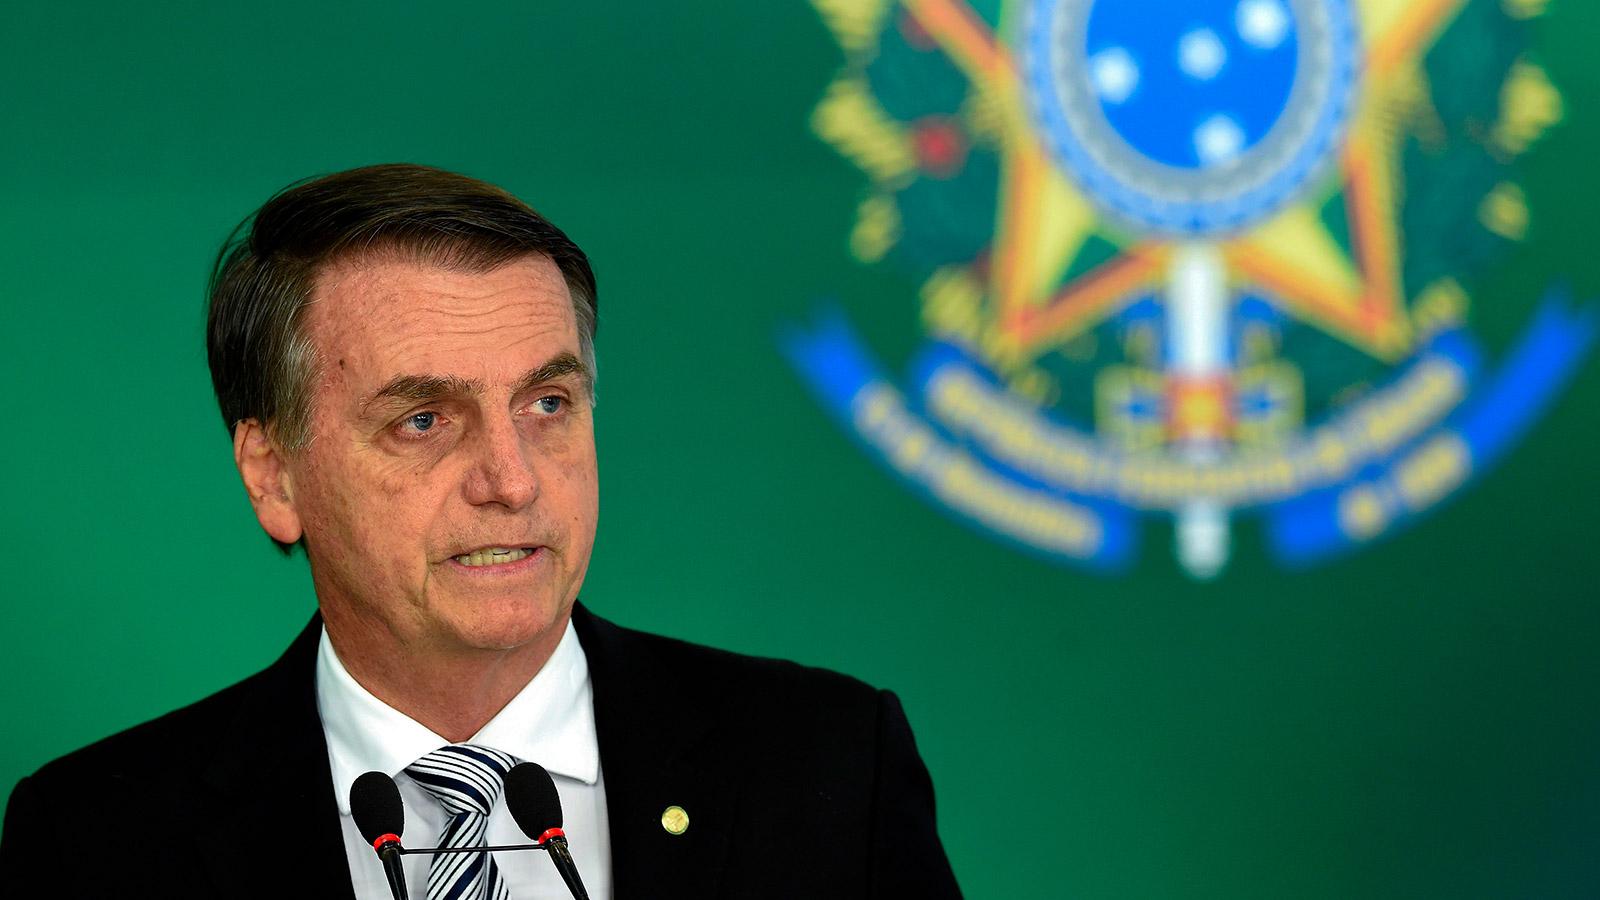 Brazilian president-elect Jair Bolsonaro